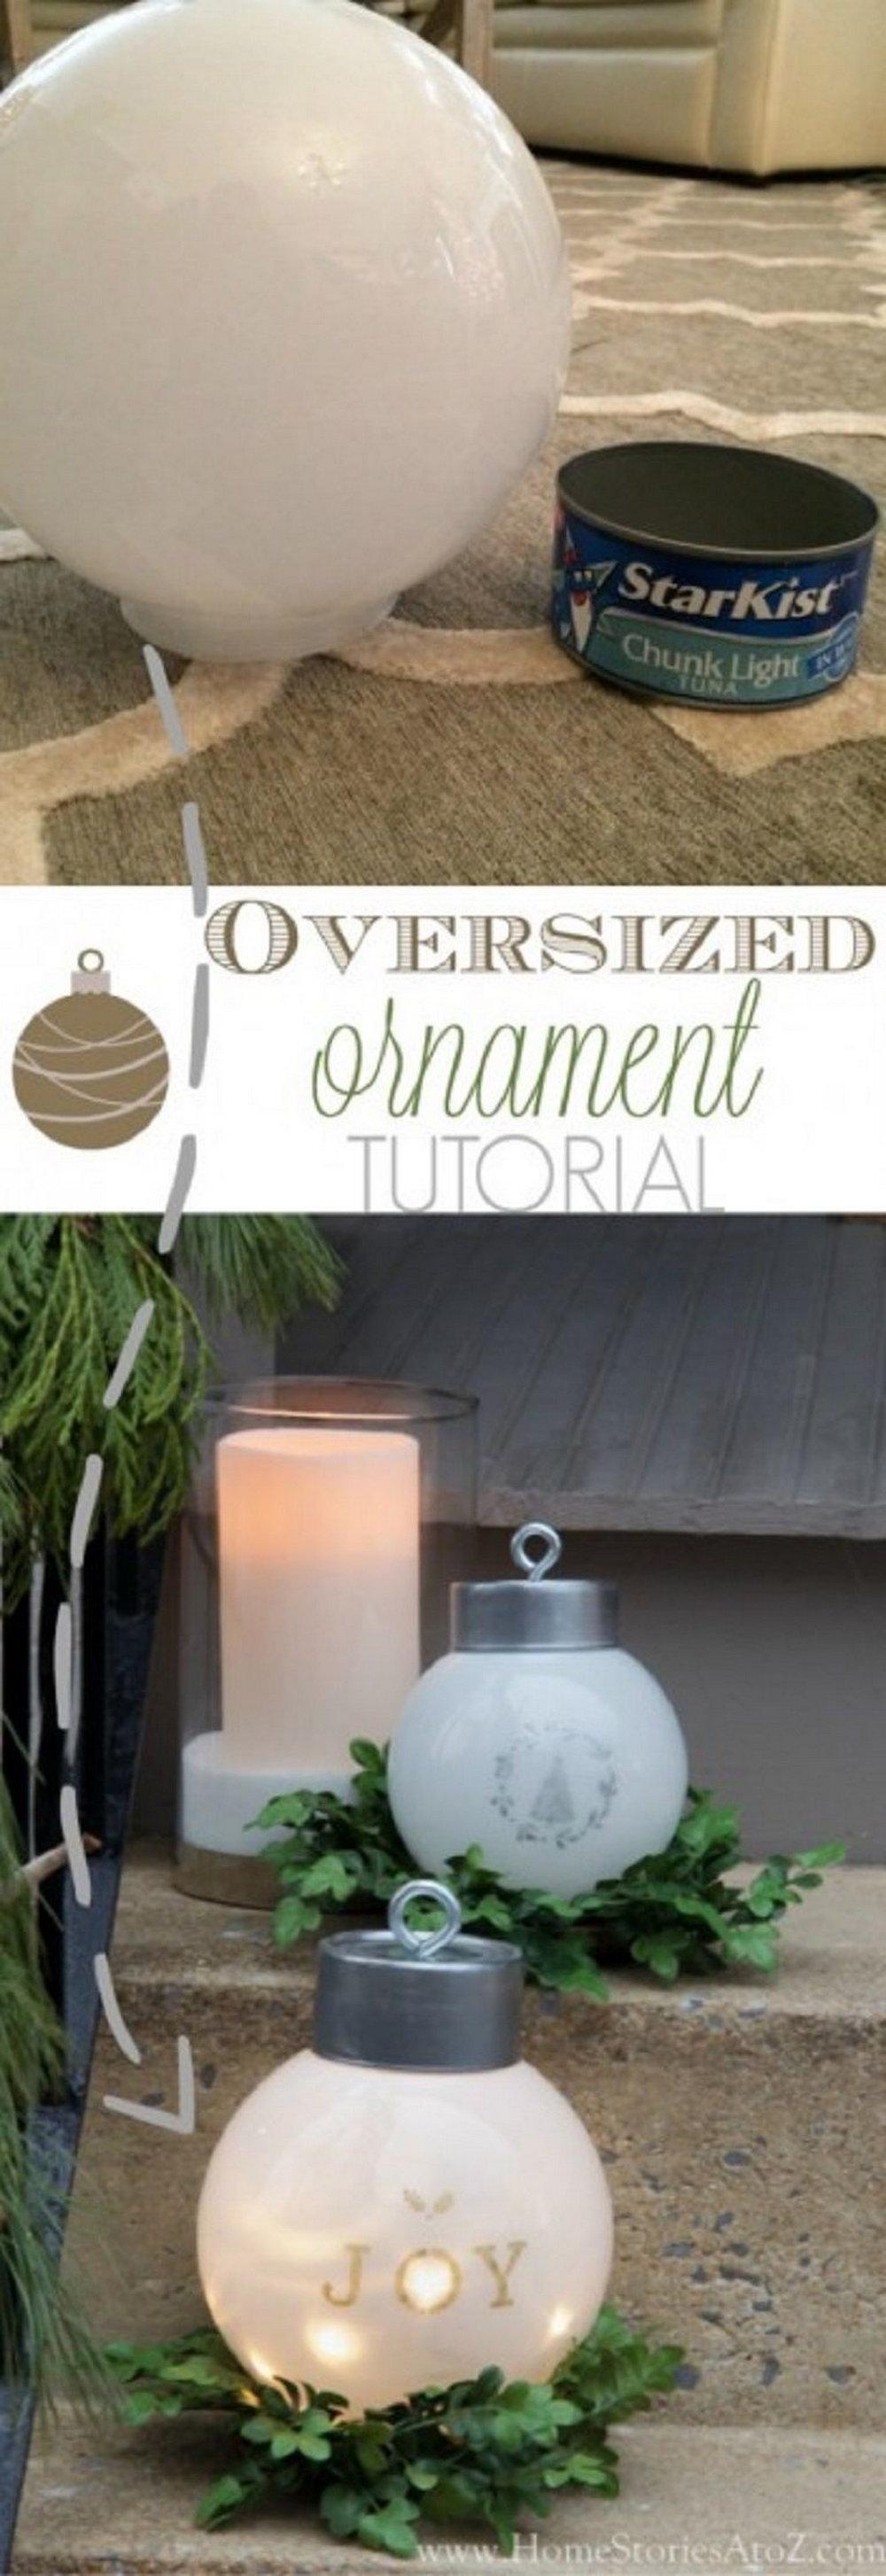 DIY Oversized Ornaments